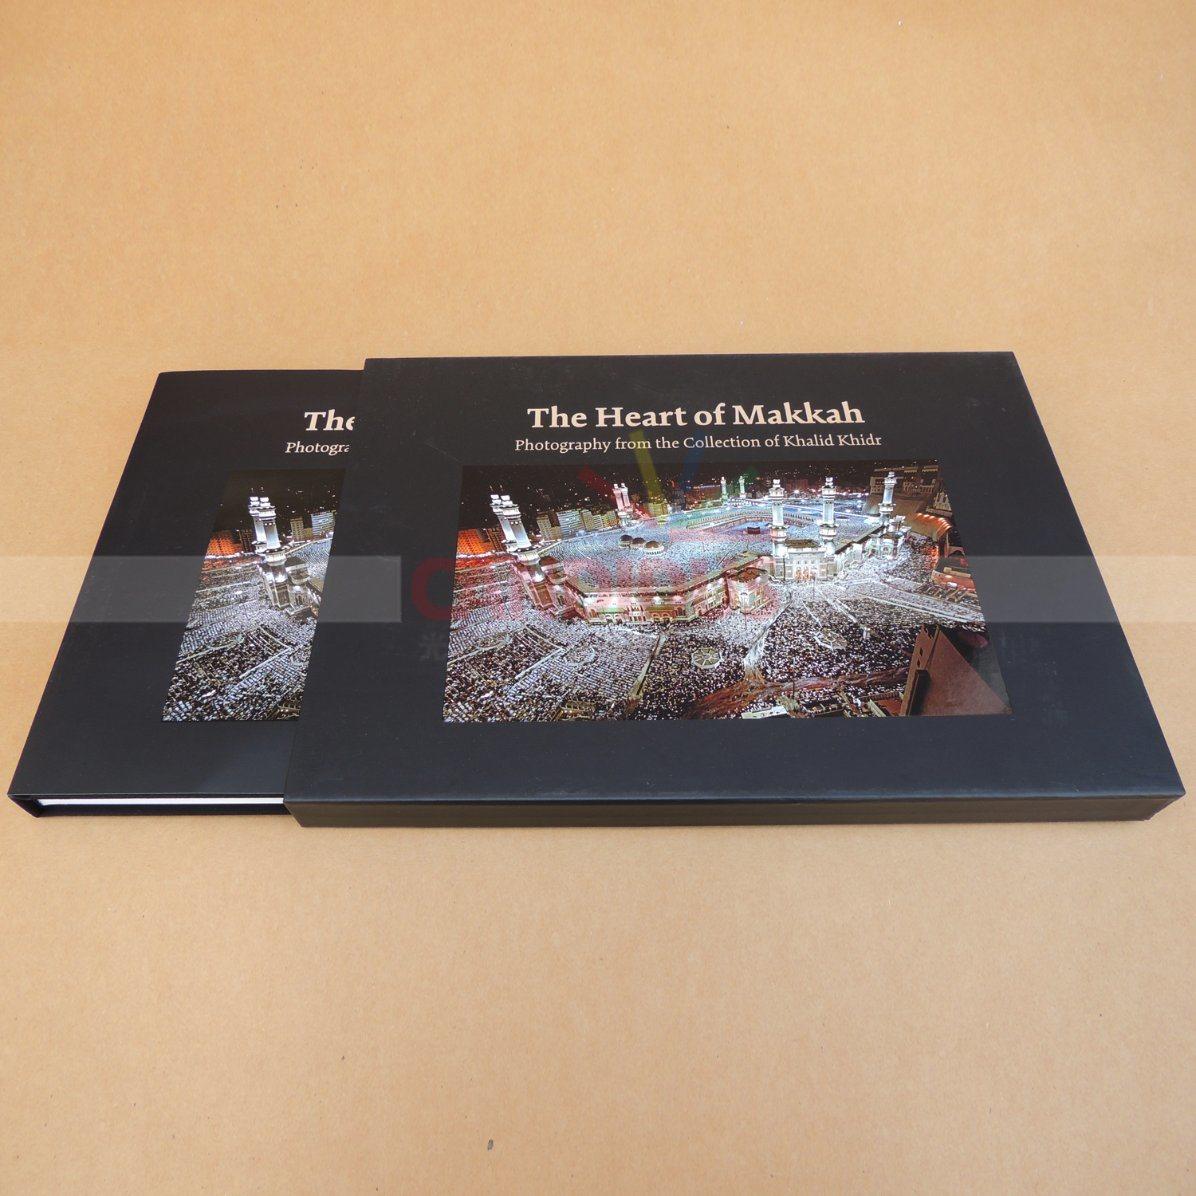 Hardcover Book Printing Photography Book Printing Cardboard Book Catalog Magazine Printing